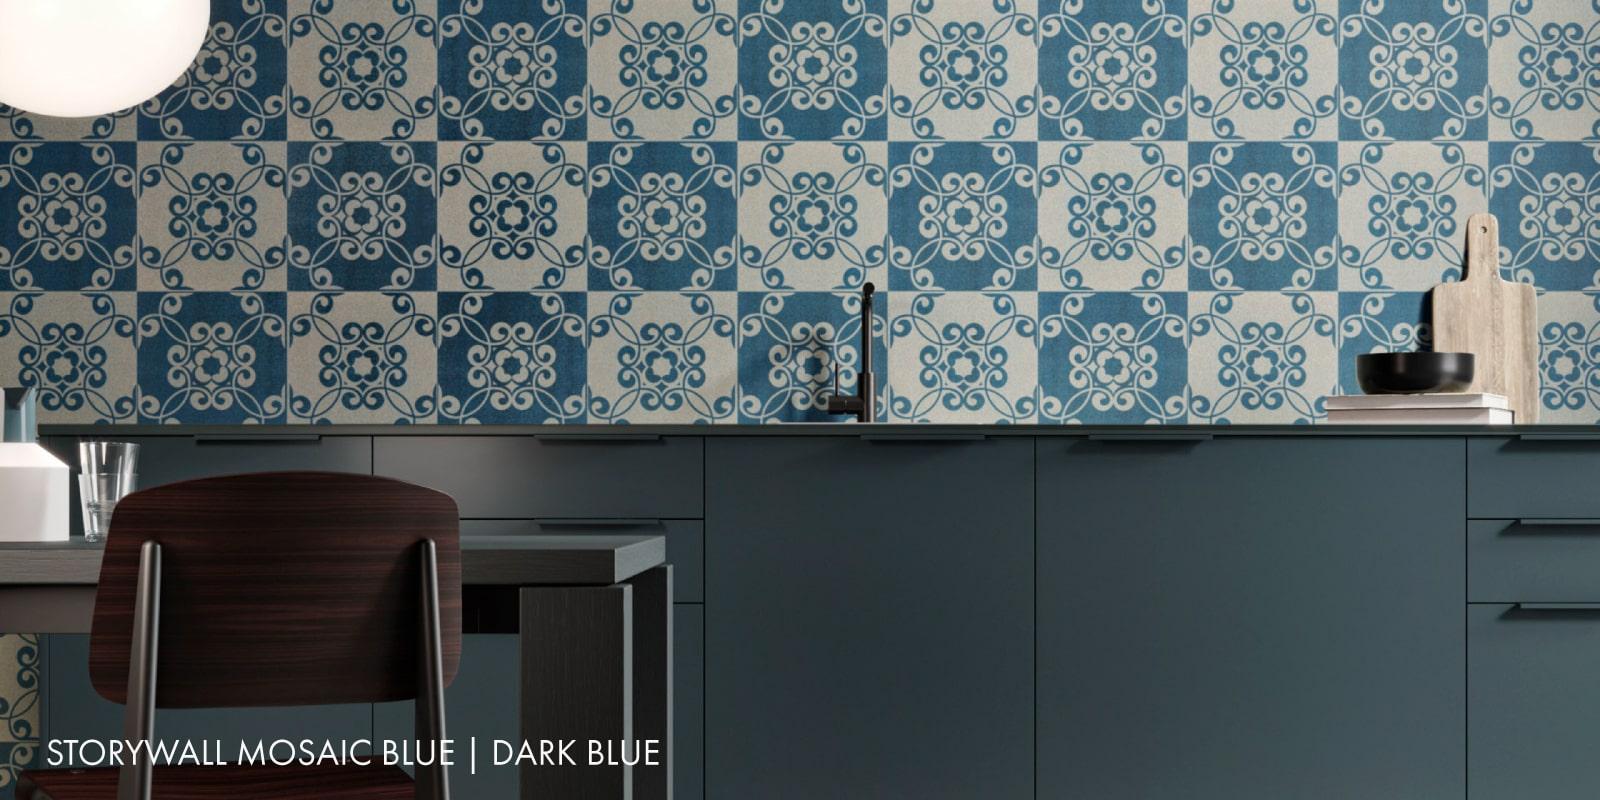 STORYWALL-MOSAIC-BLUE---DARK-BLUE-.jpg